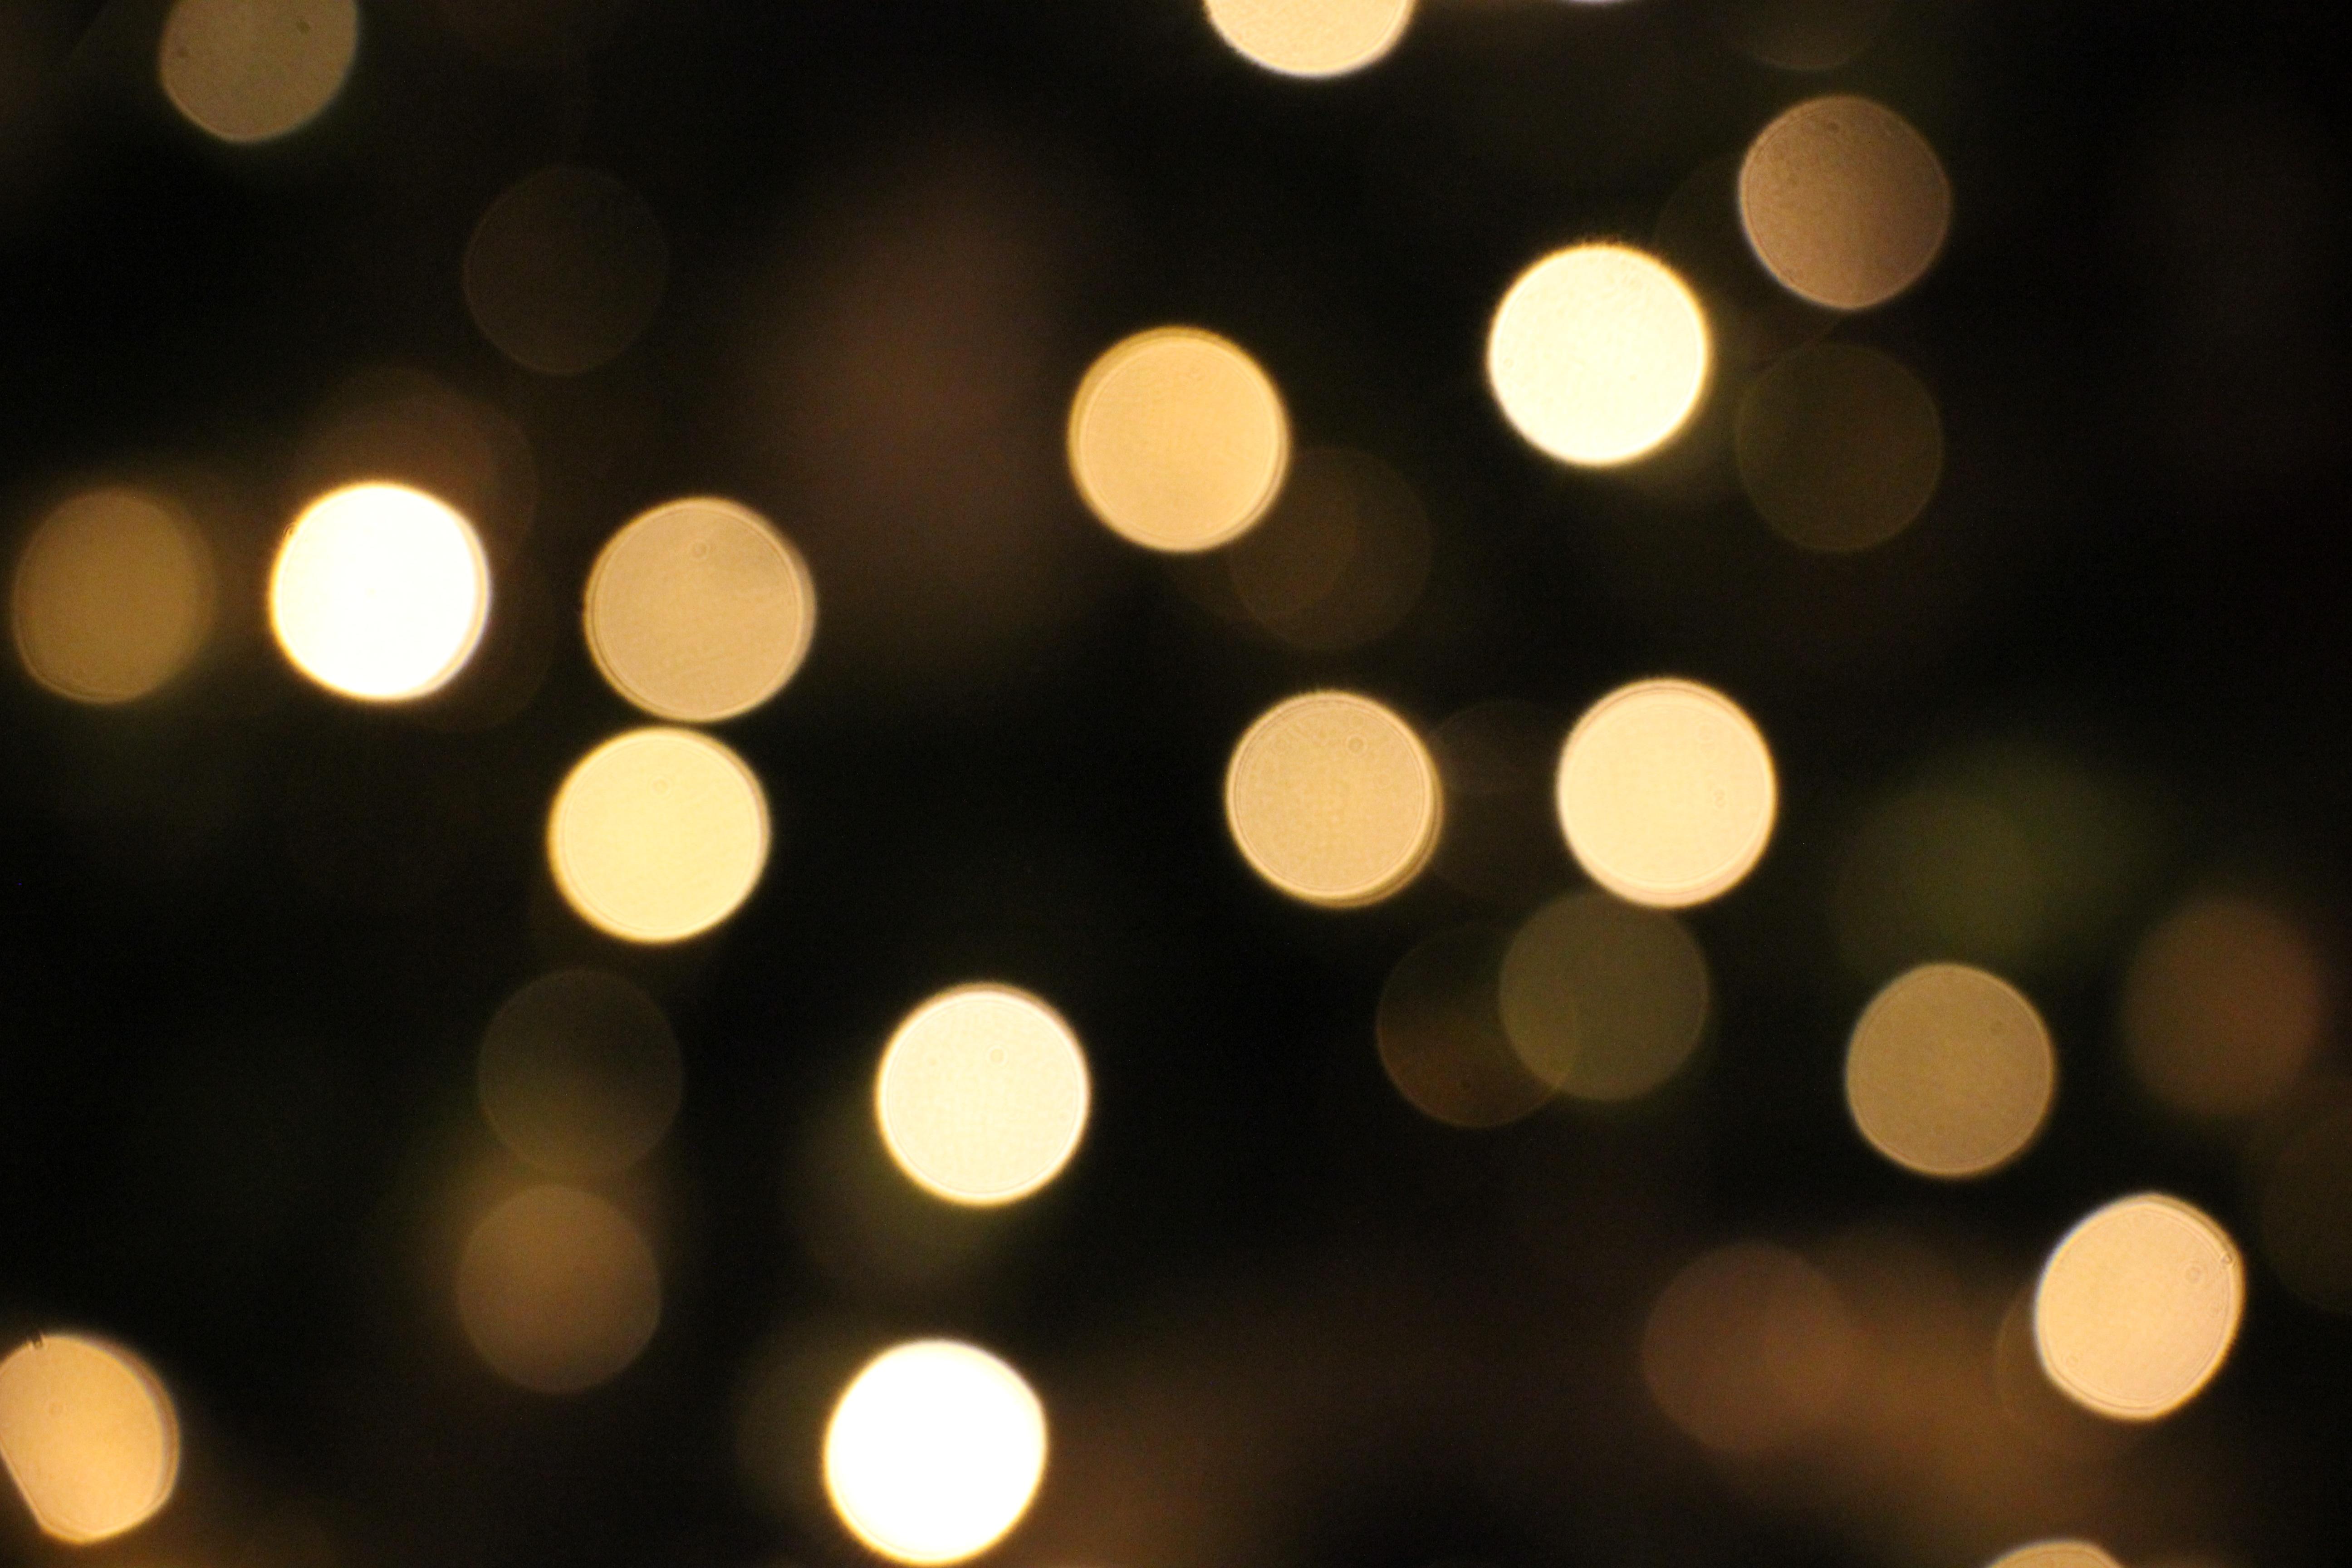 Free images night darkness christmas lighting circle background light fixture macro - Light night wallpaper ...